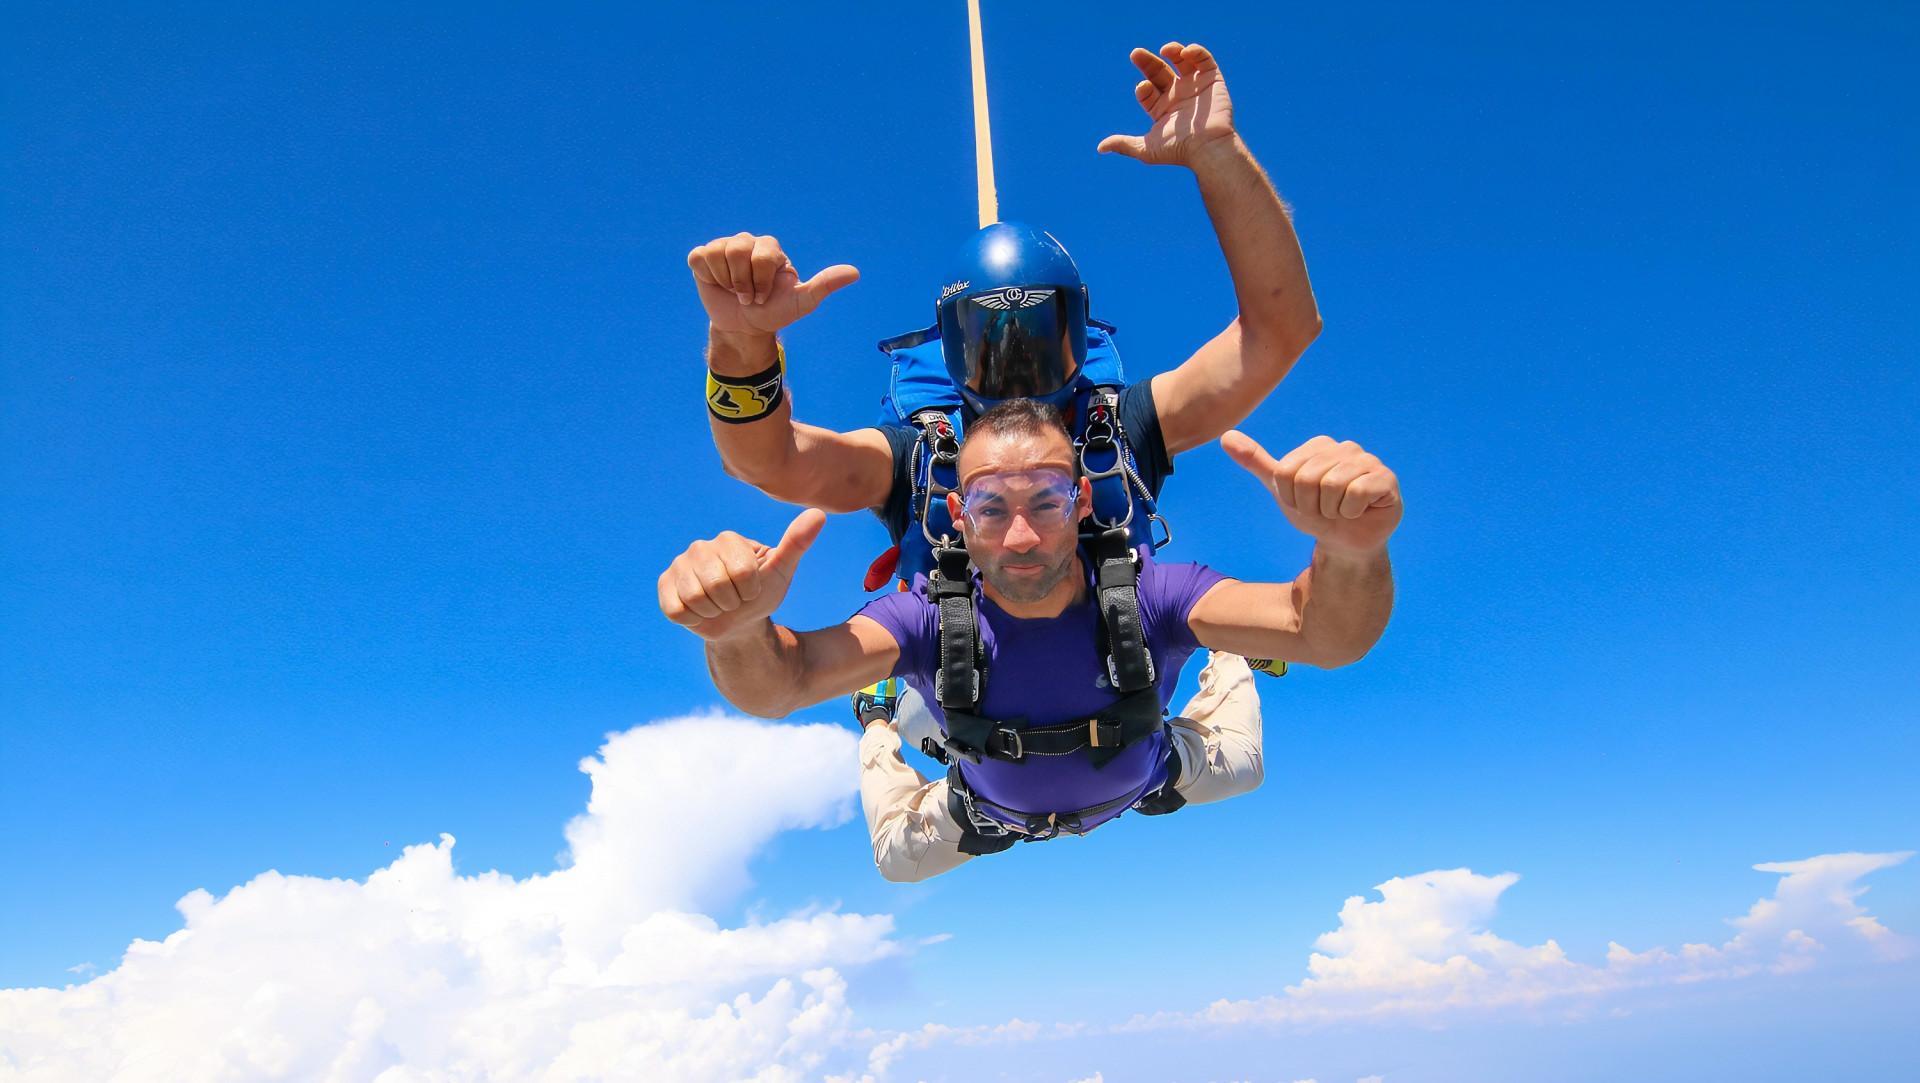 Lancio in tandem con paracadute a Siracusa